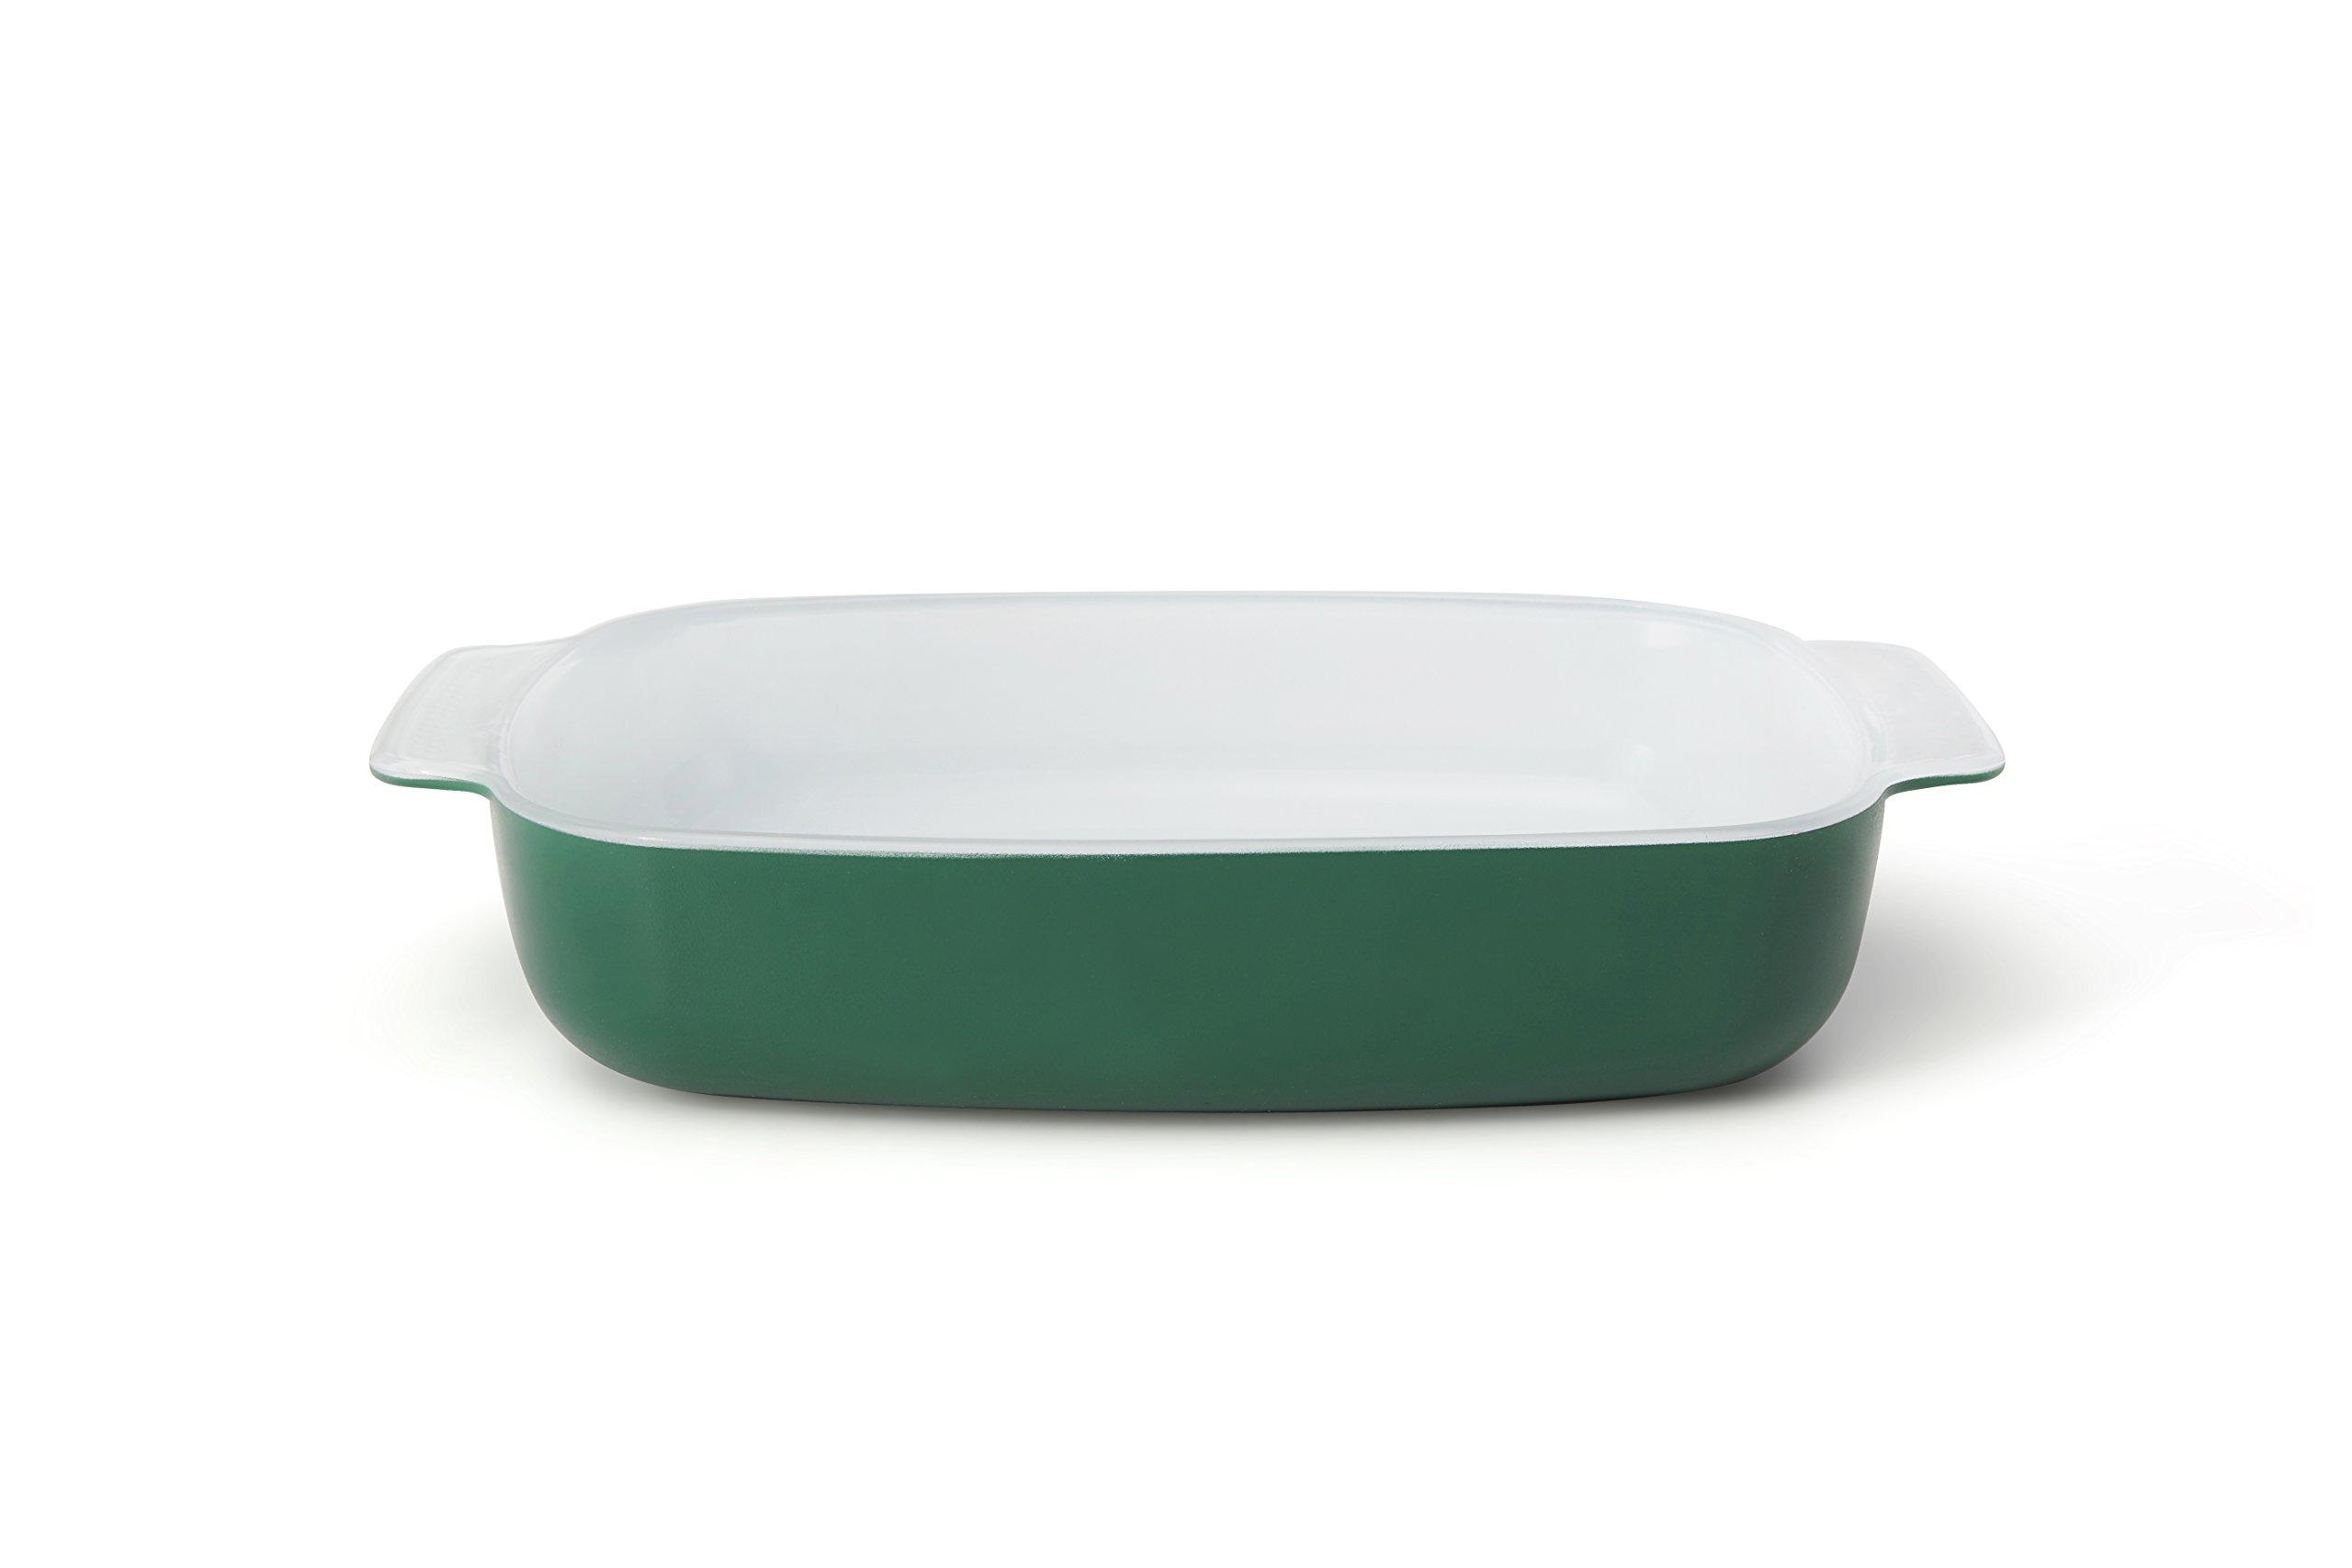 Creo SmartGlass Cookware, 2-quart Baking Dish, Bali Green